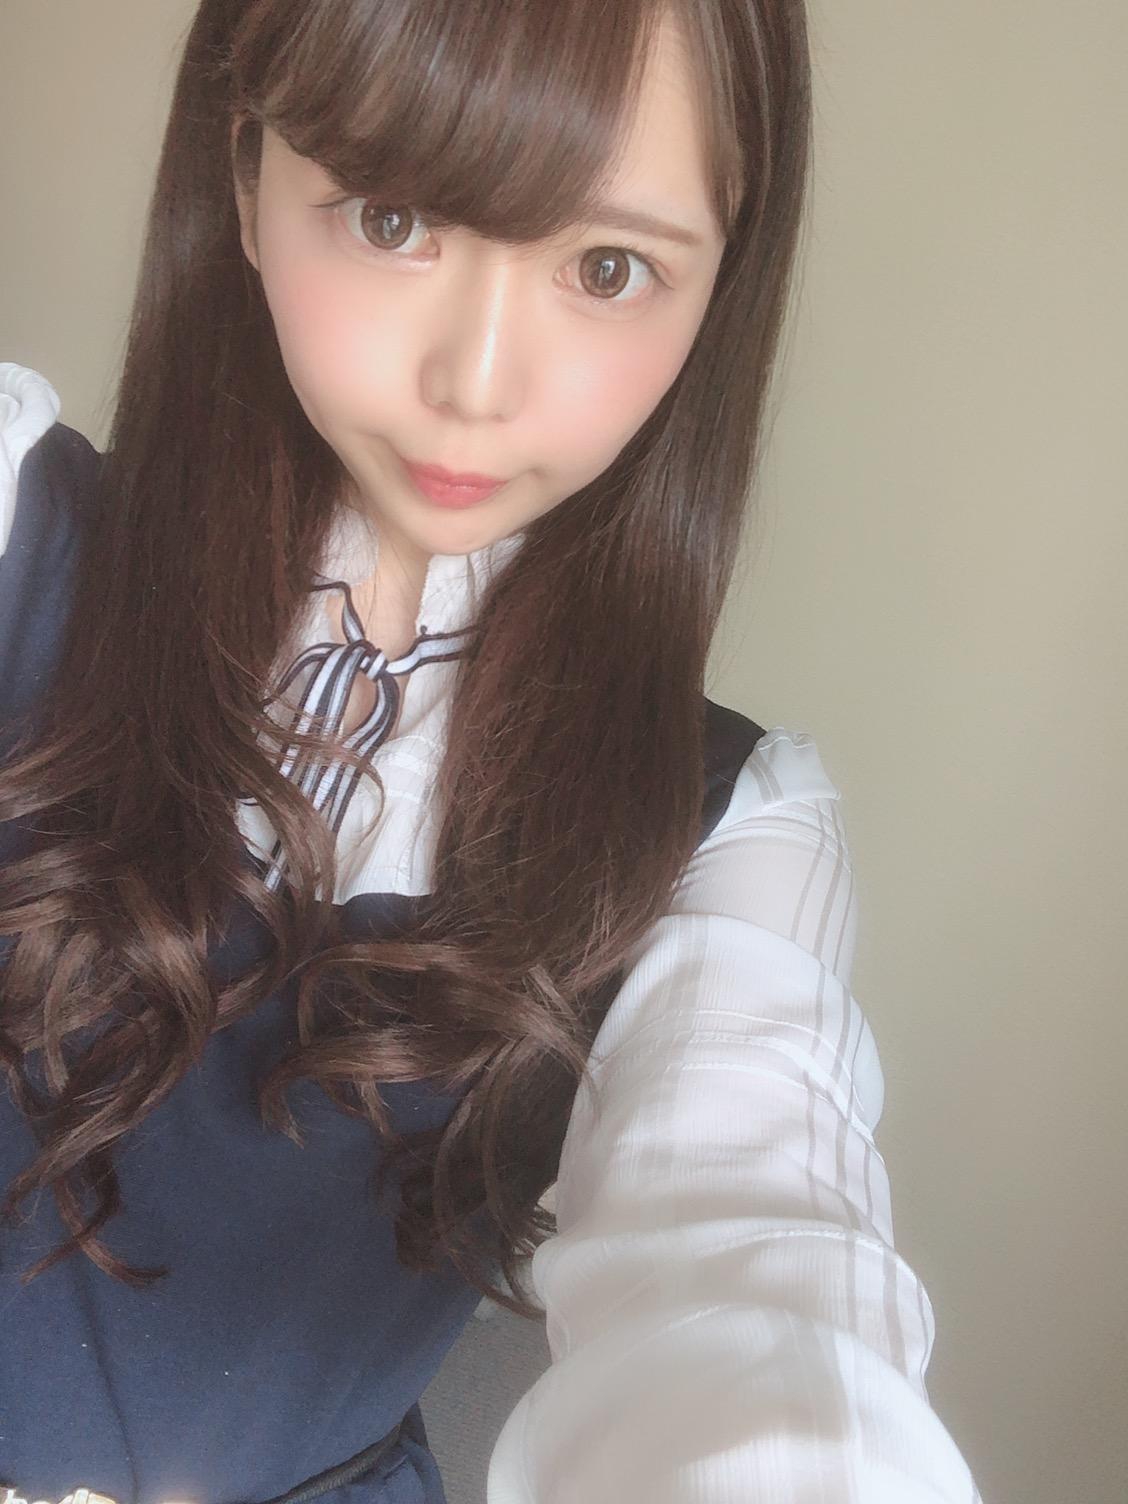 https://s3-ap-northeast-1.amazonaws.com/files.deli-fuzoku.jp/img/shop/numazu55/diary/43635513/d_0_20190420162820019.jpeg